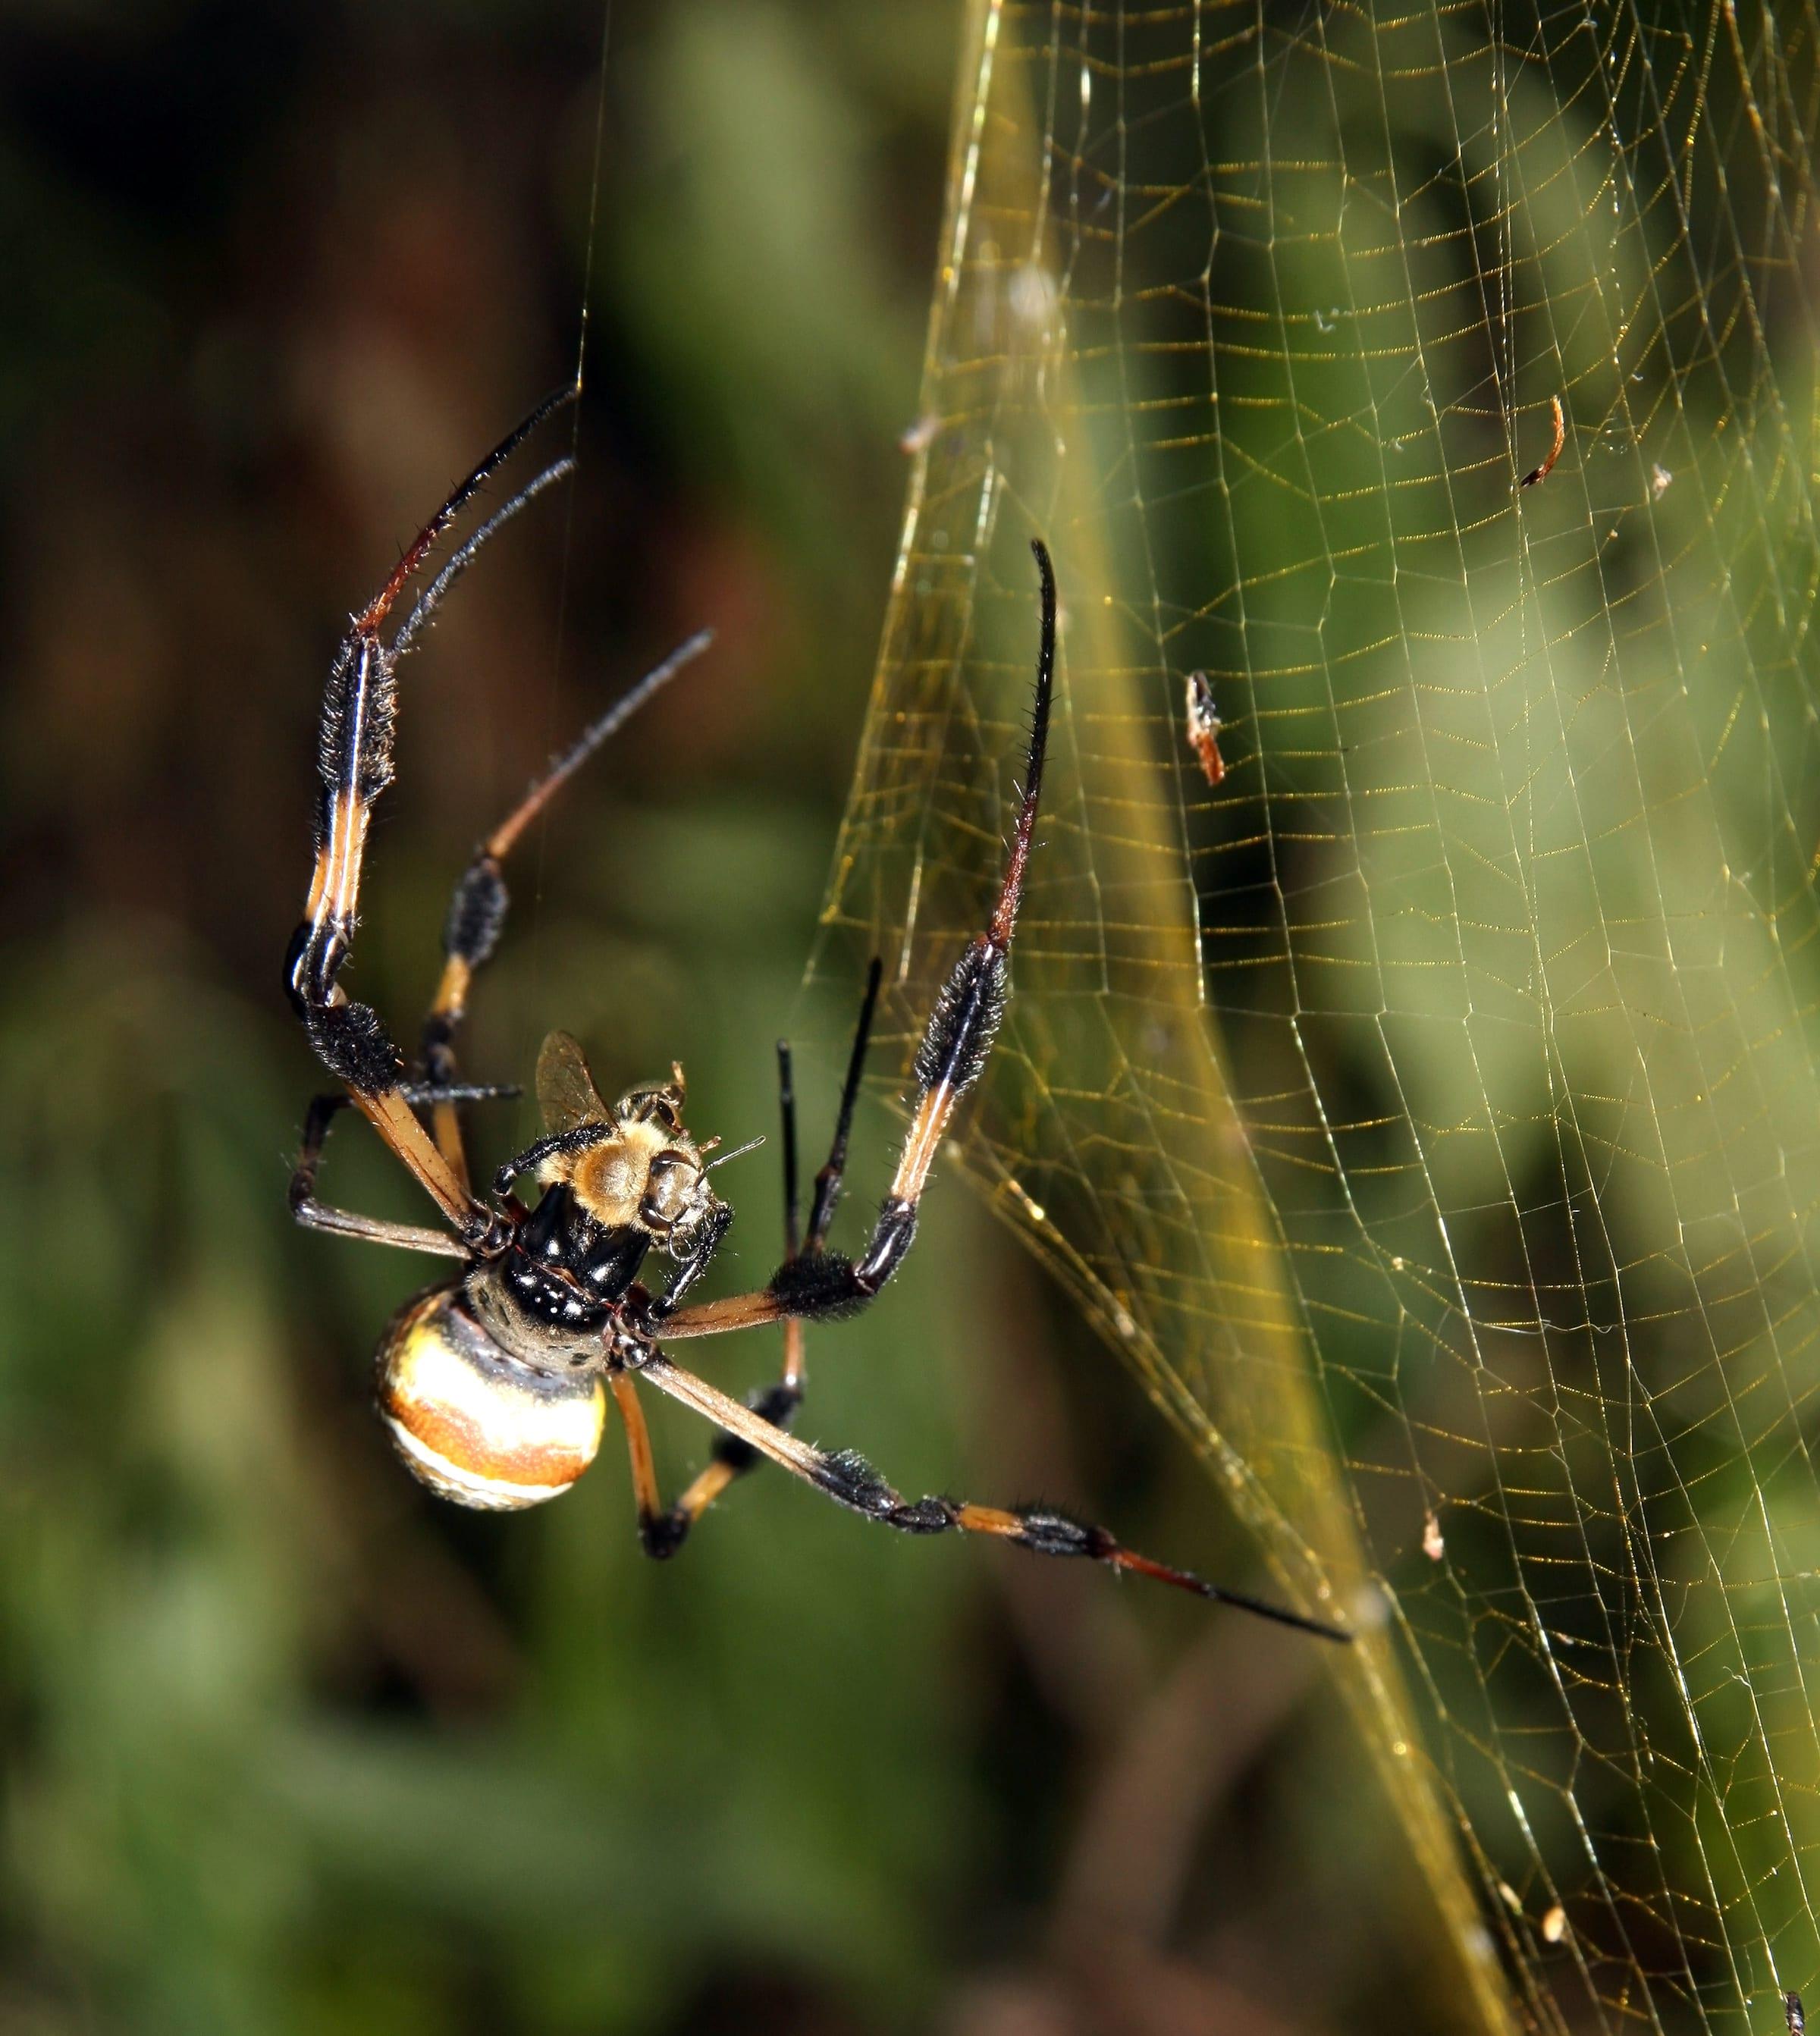 A banana spider (Nephila clavipes or Trichonephila clavipes) biting a honey bee ( Apis mellifera ).  Photo: Ianaré Sévi CC BY-SA 3.0